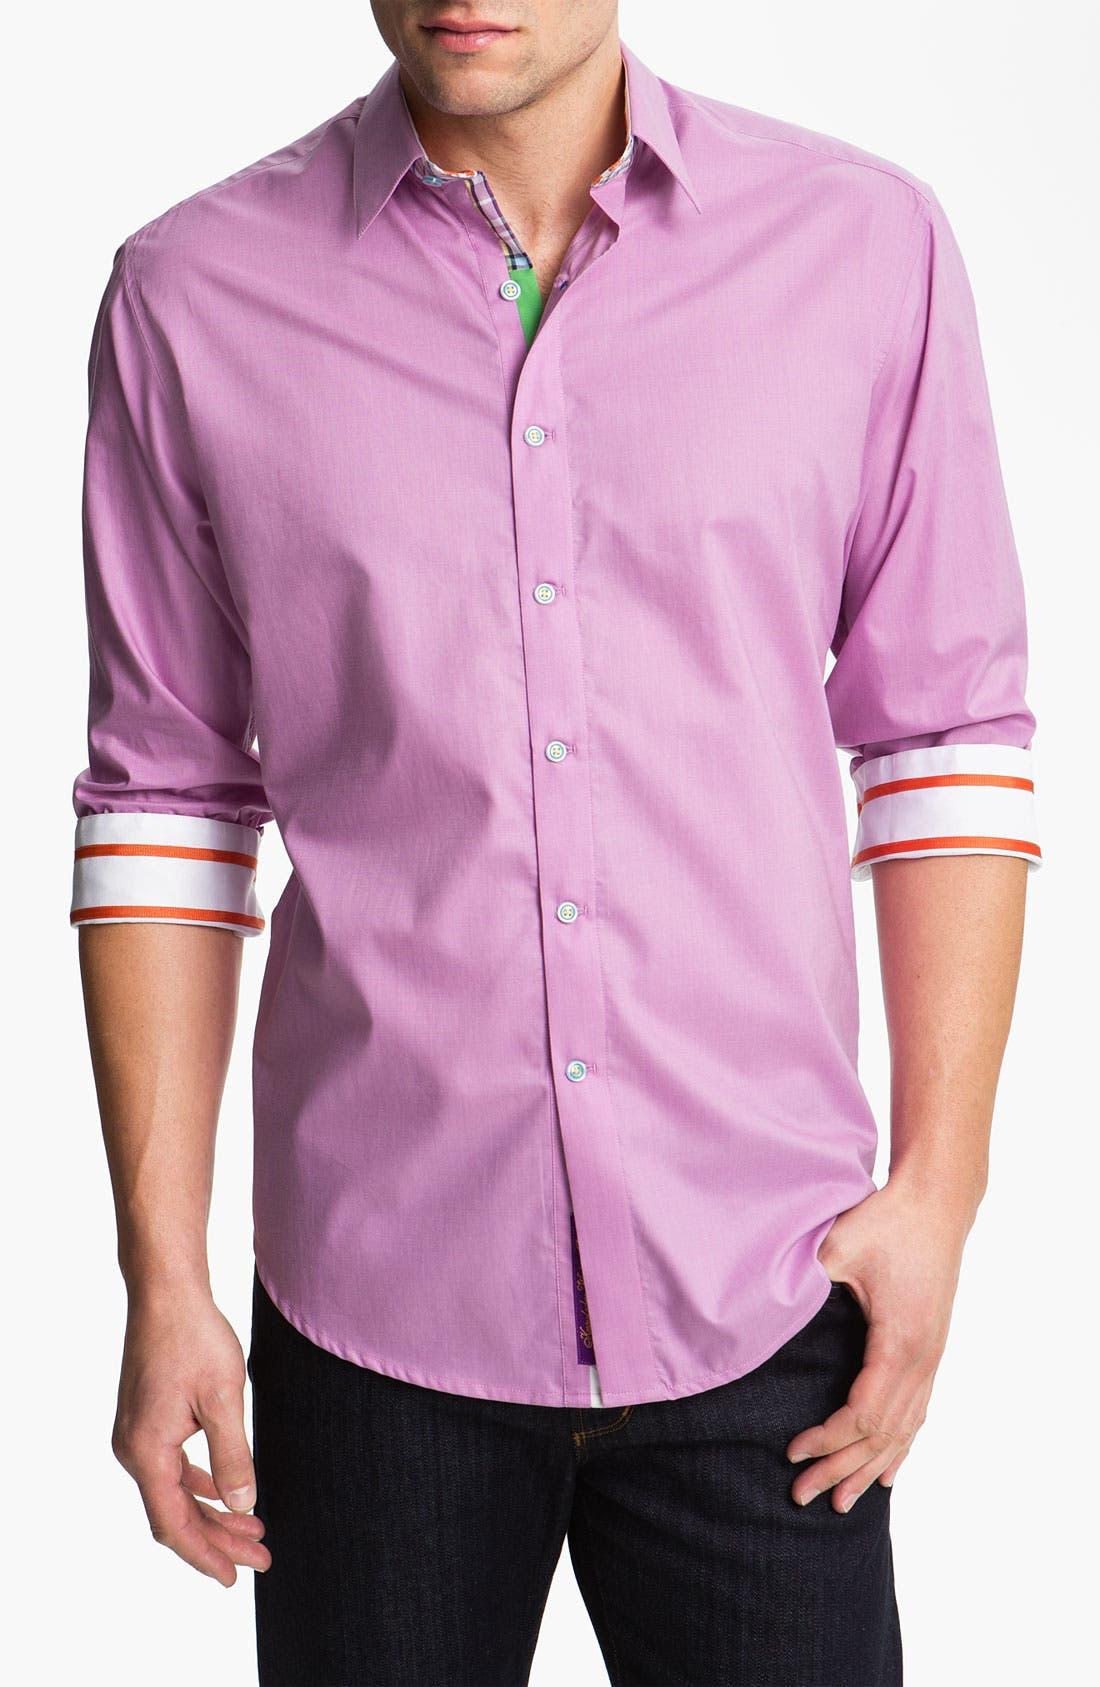 Alternate Image 1 Selected - Robert Graham 'Bay Shore' Sport Shirt